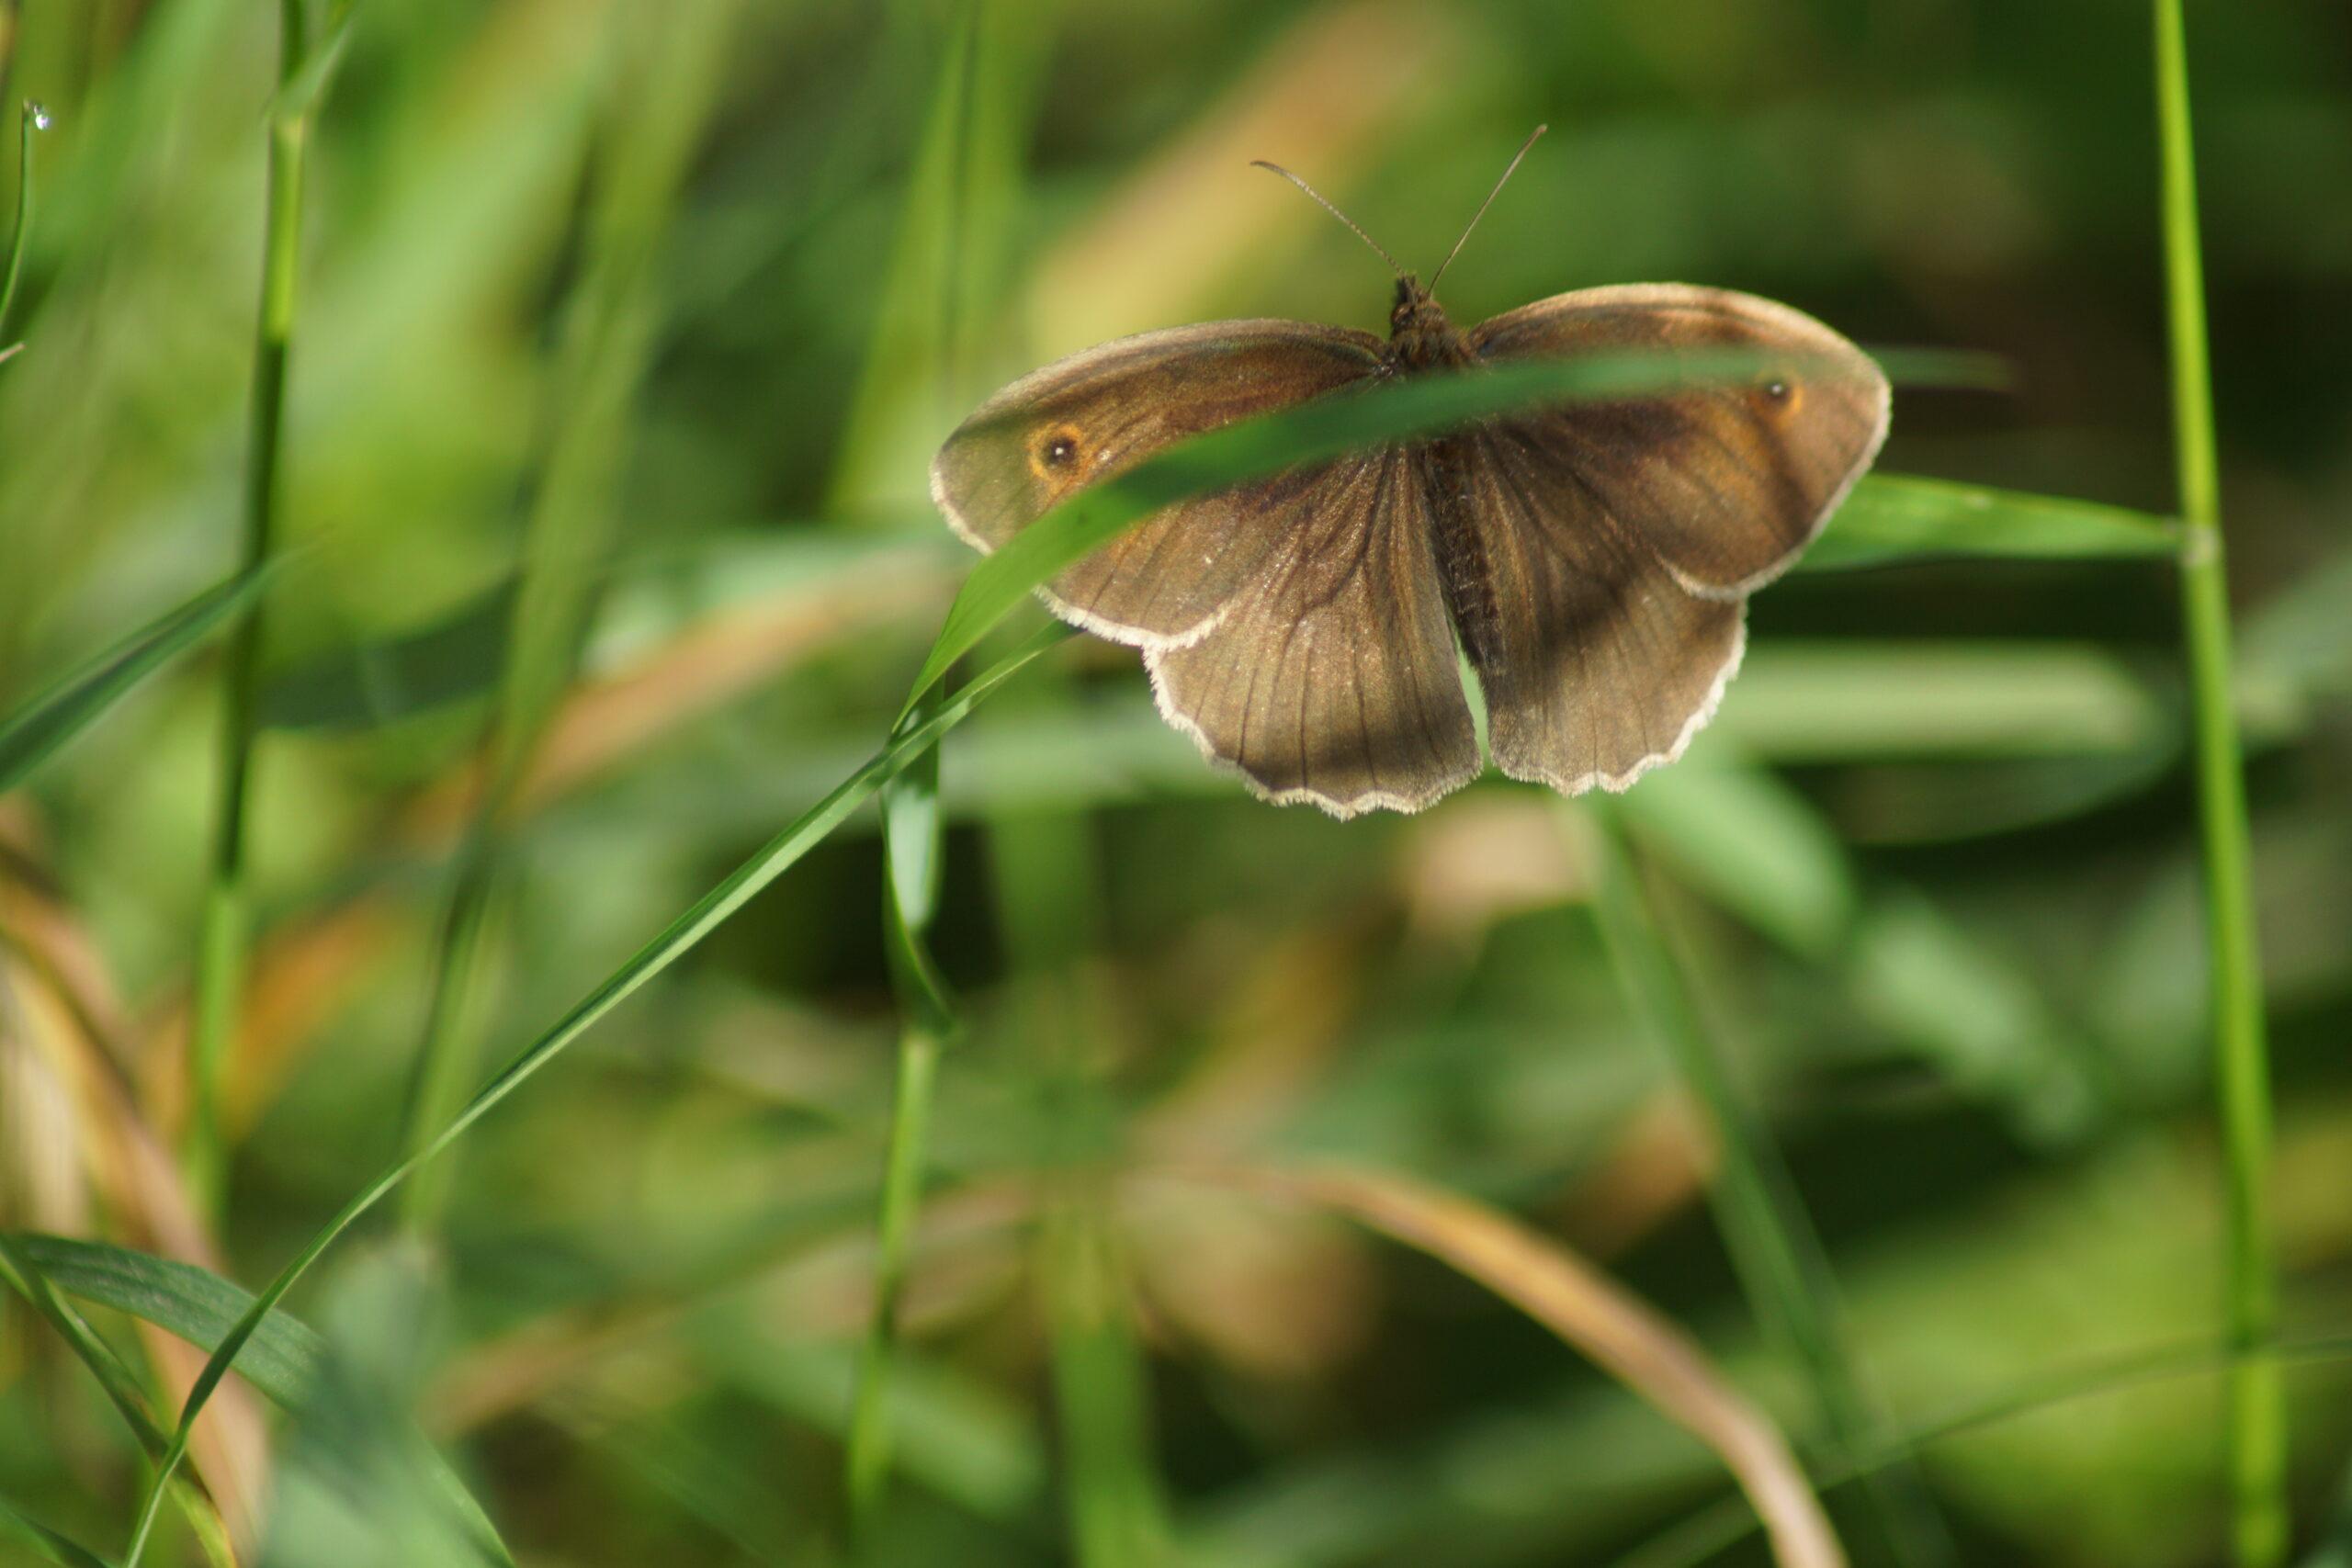 Male Meadow brown